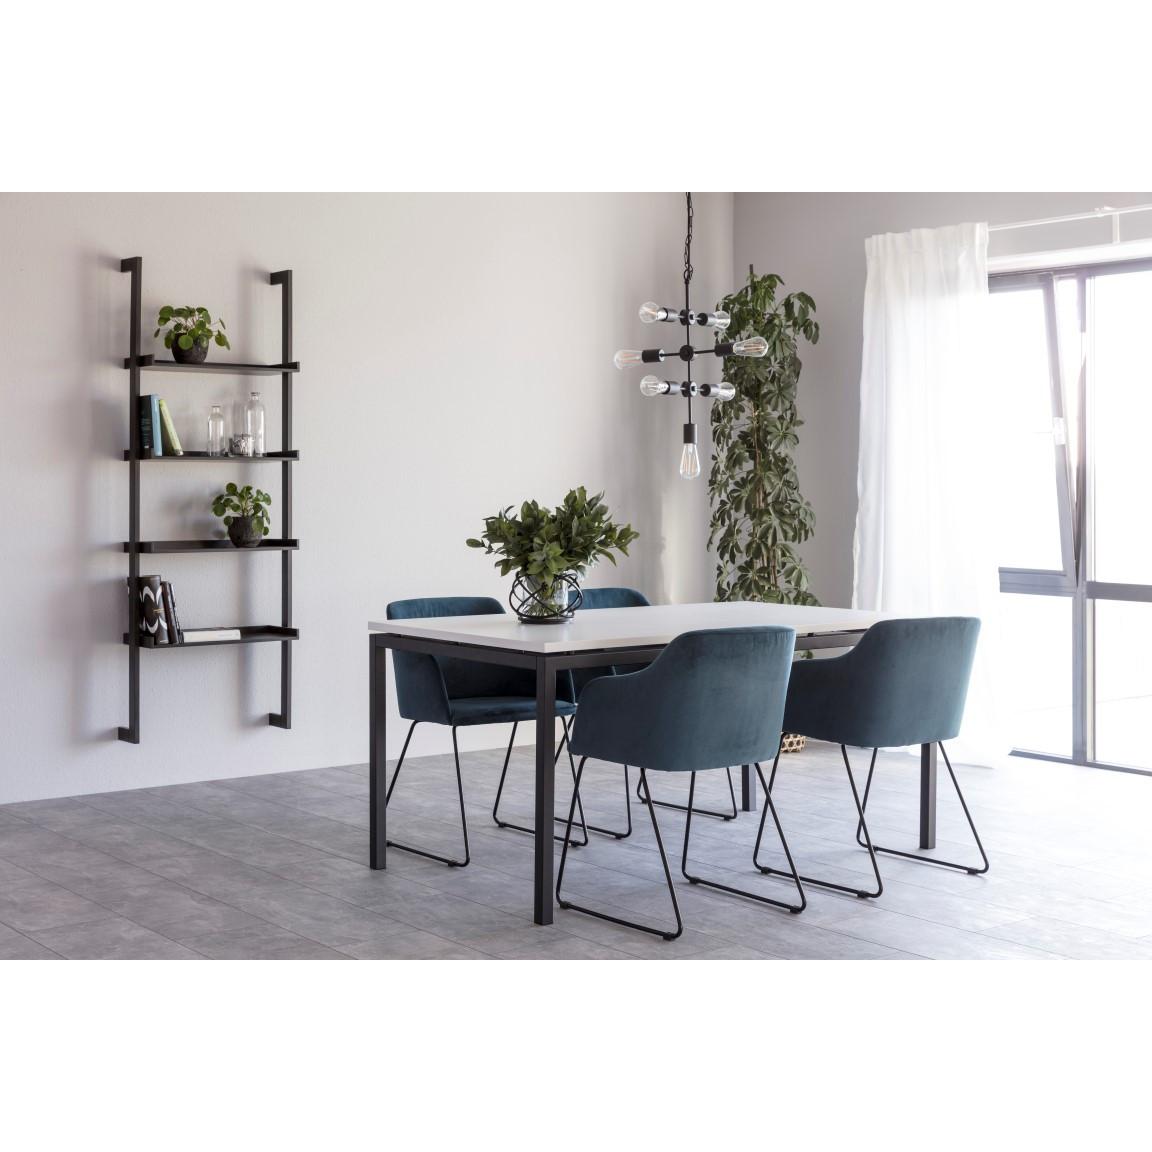 Dining Table Kobe 160 x 90 cm | White